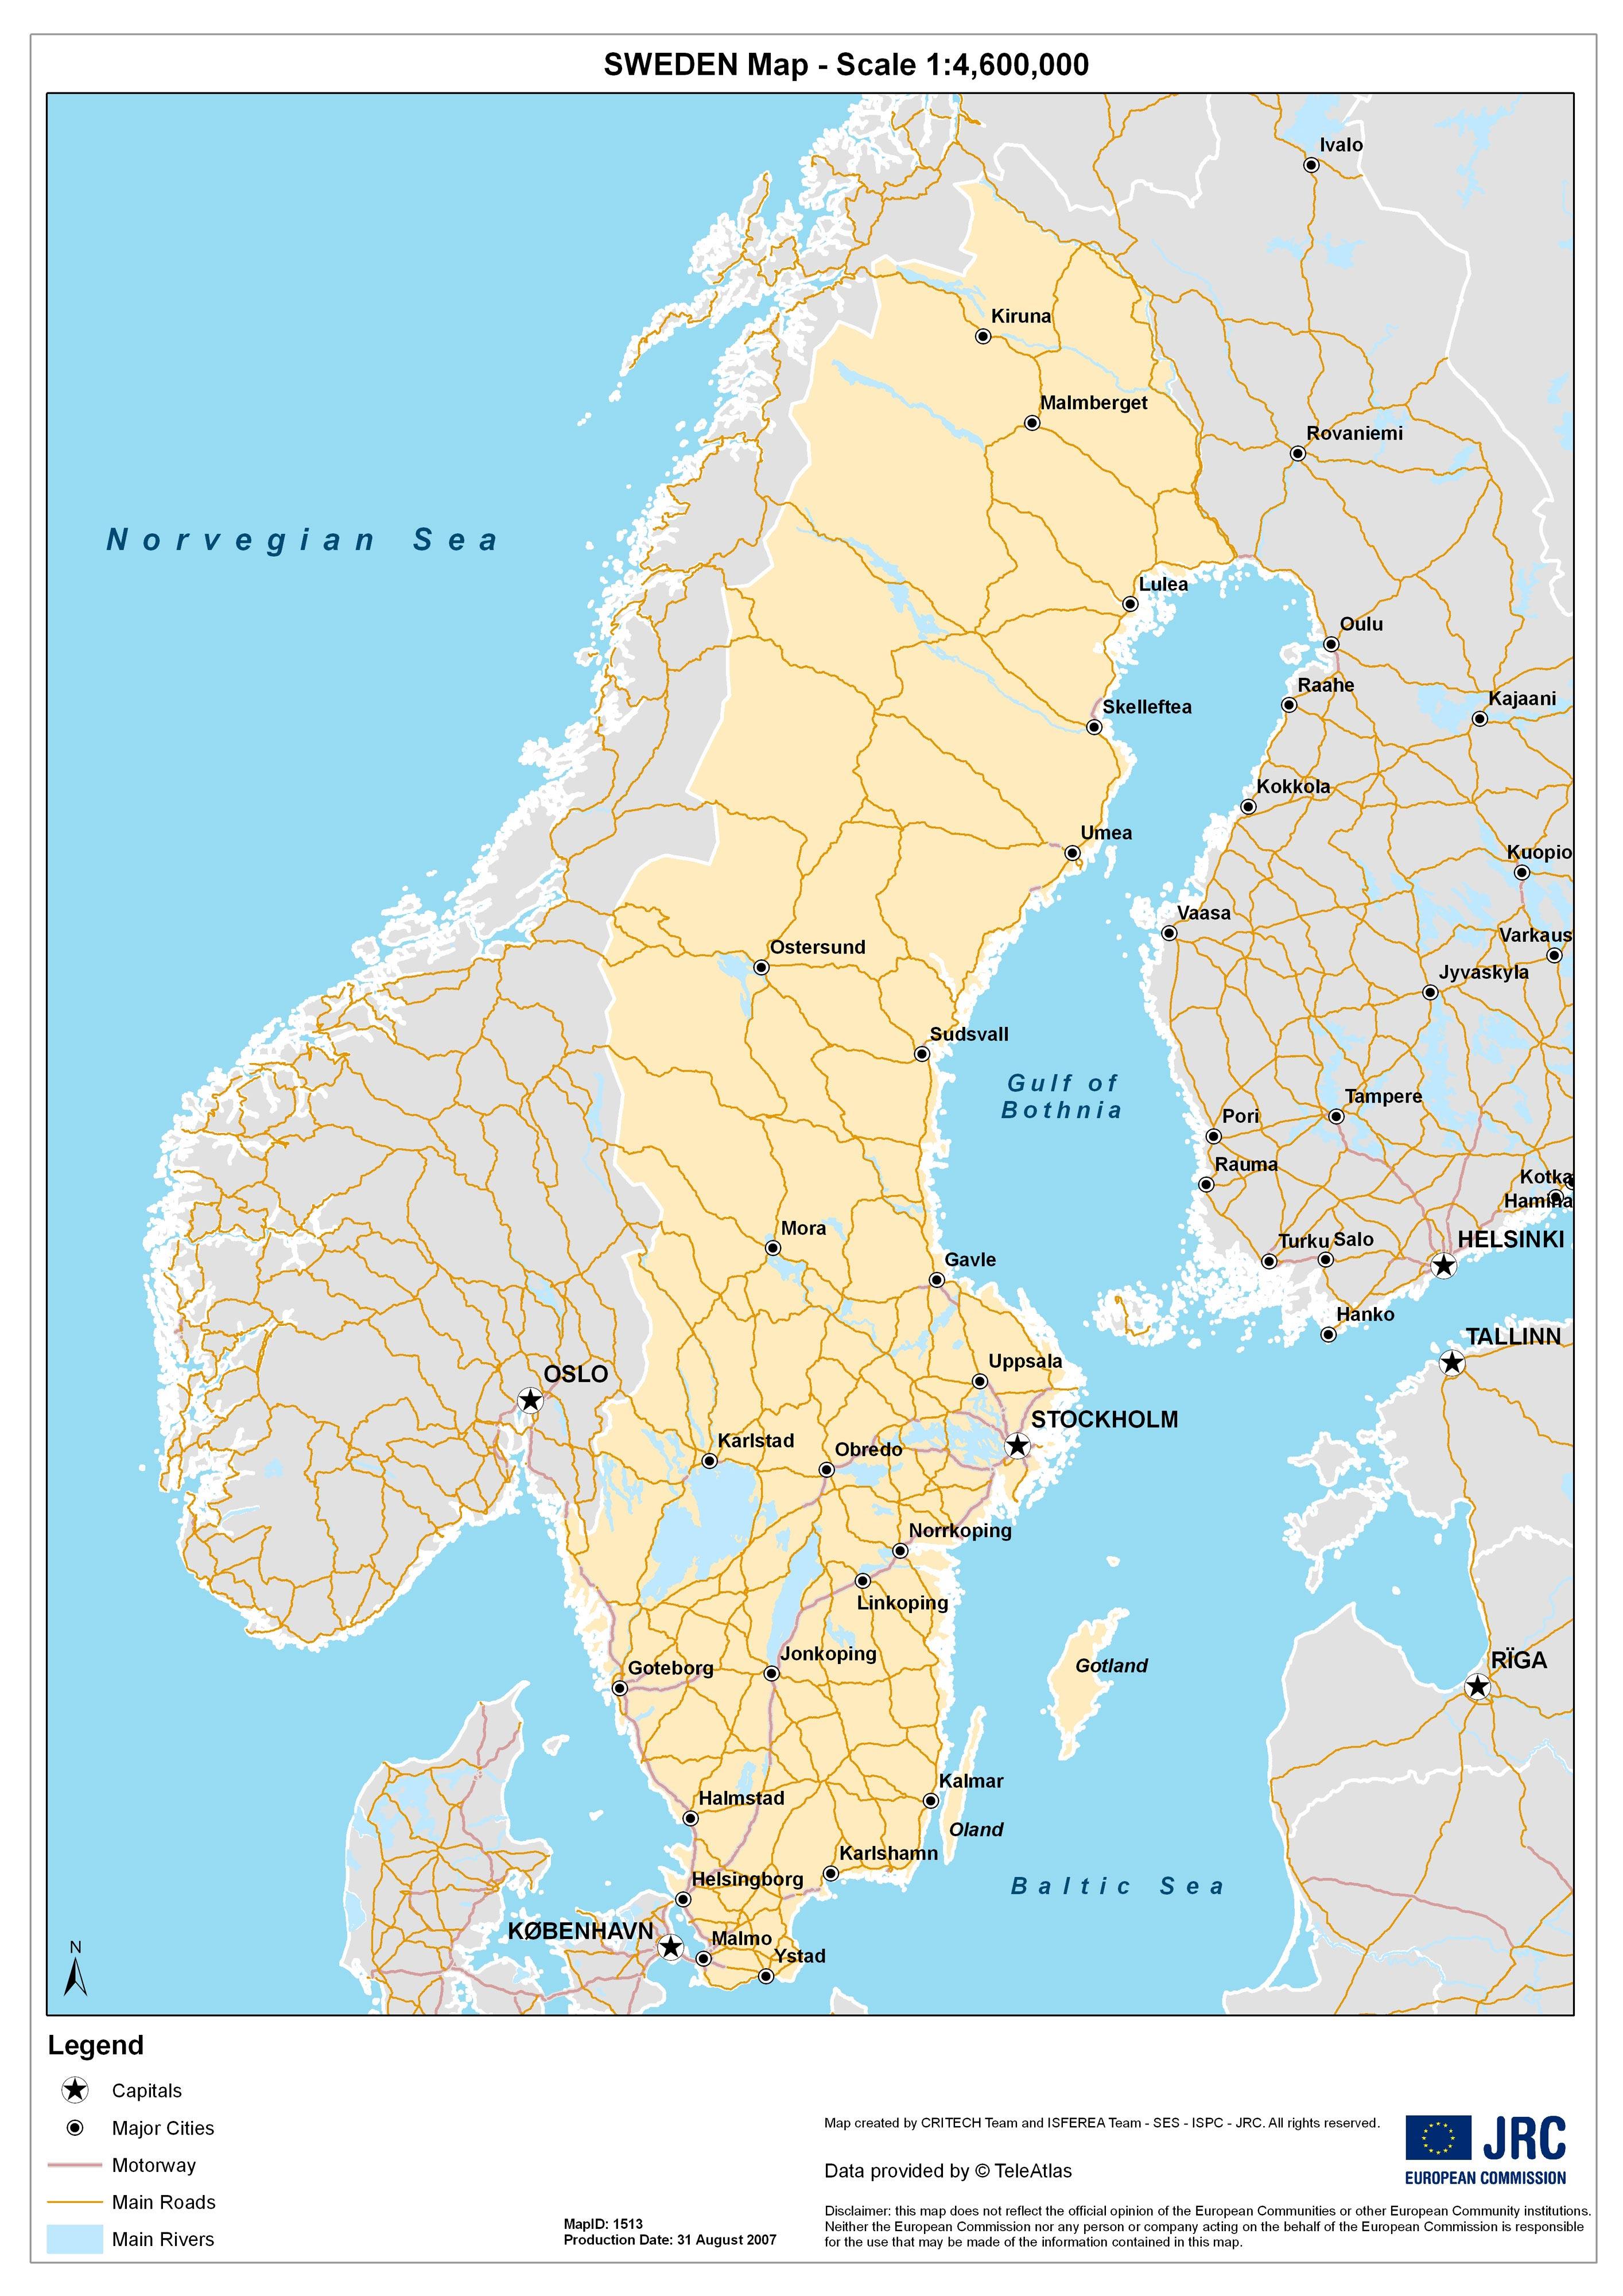 karte von schweden Karten von Schweden | Karten von Schweden zum Herunterladen und  karte von schweden